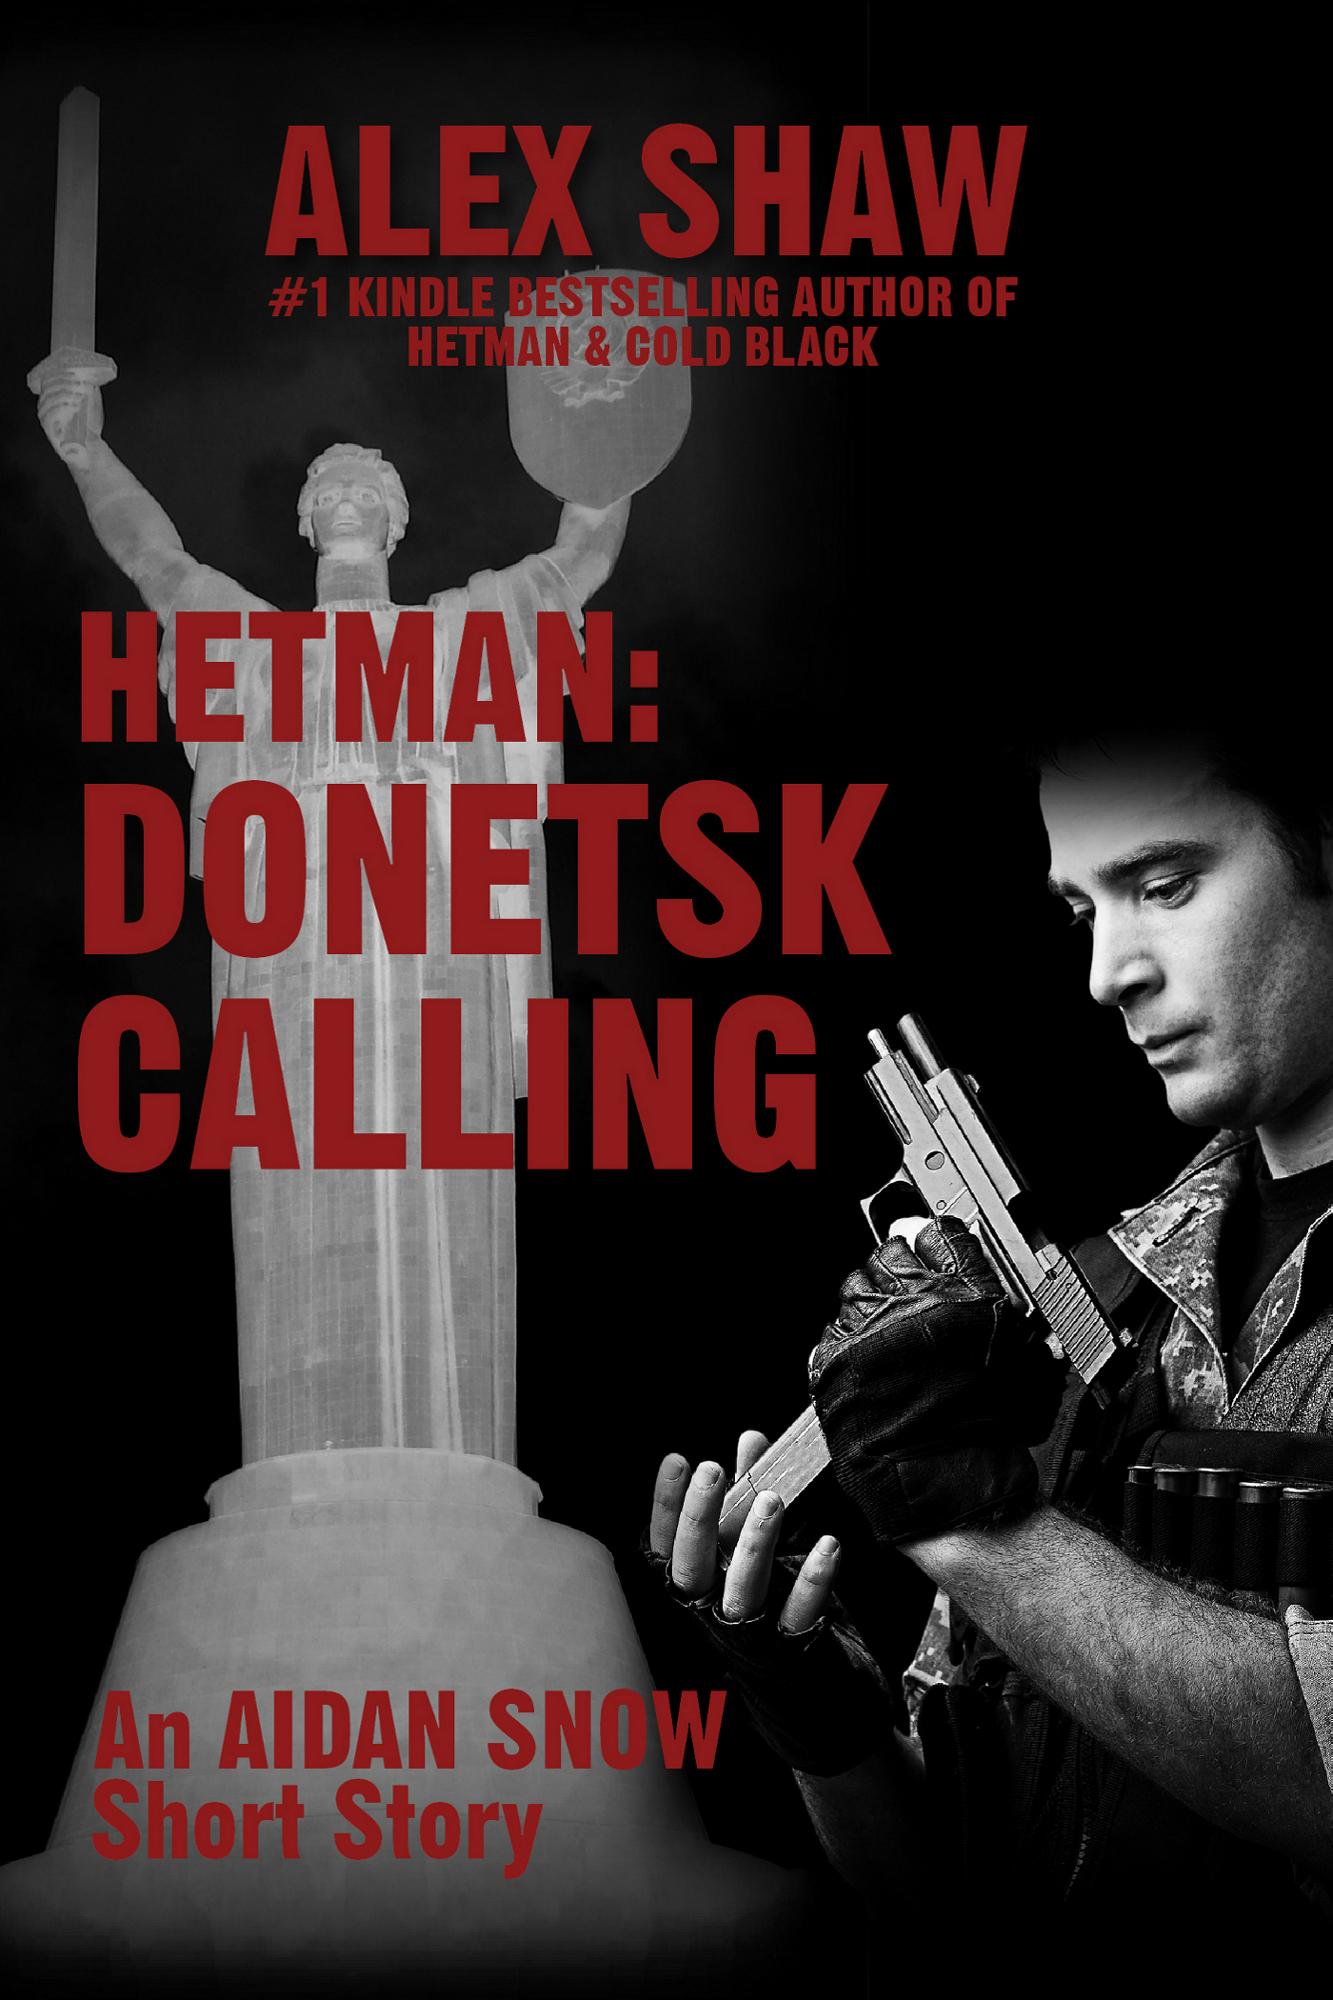 Hetman: Donetsk Calling